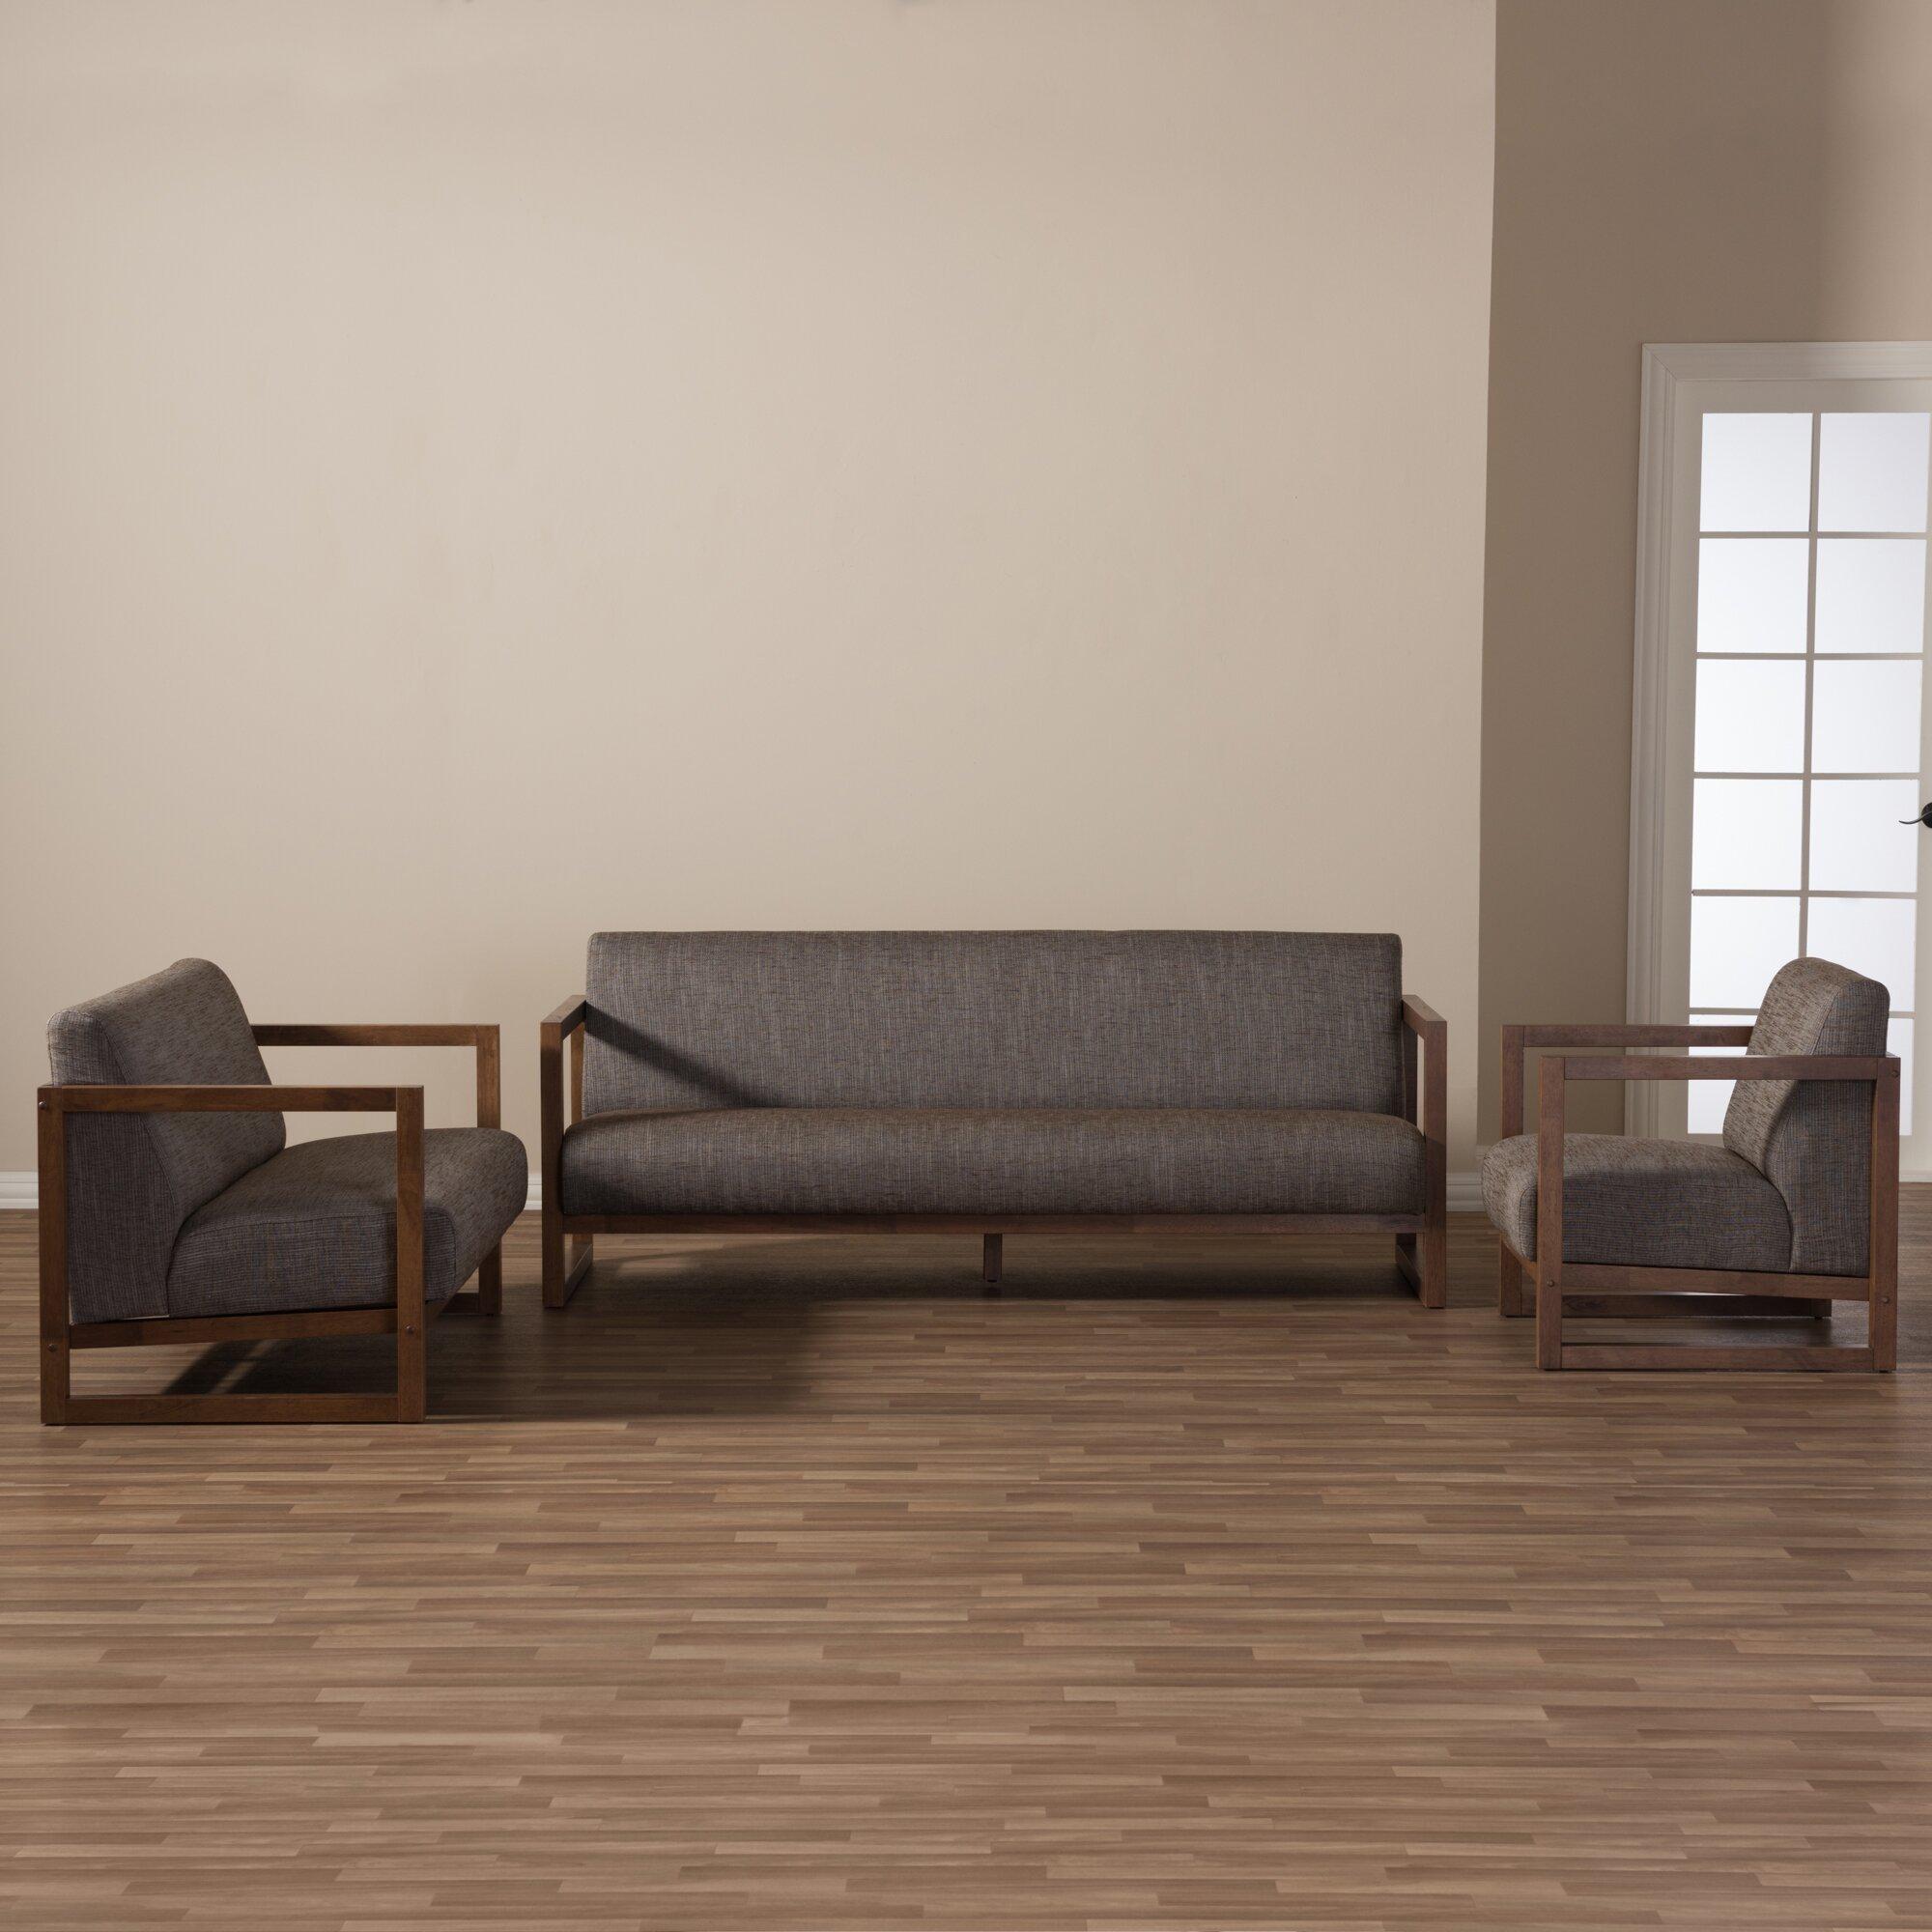 Wholesale interiors baxton studio valencia mid century 3 for 3 piece living room set